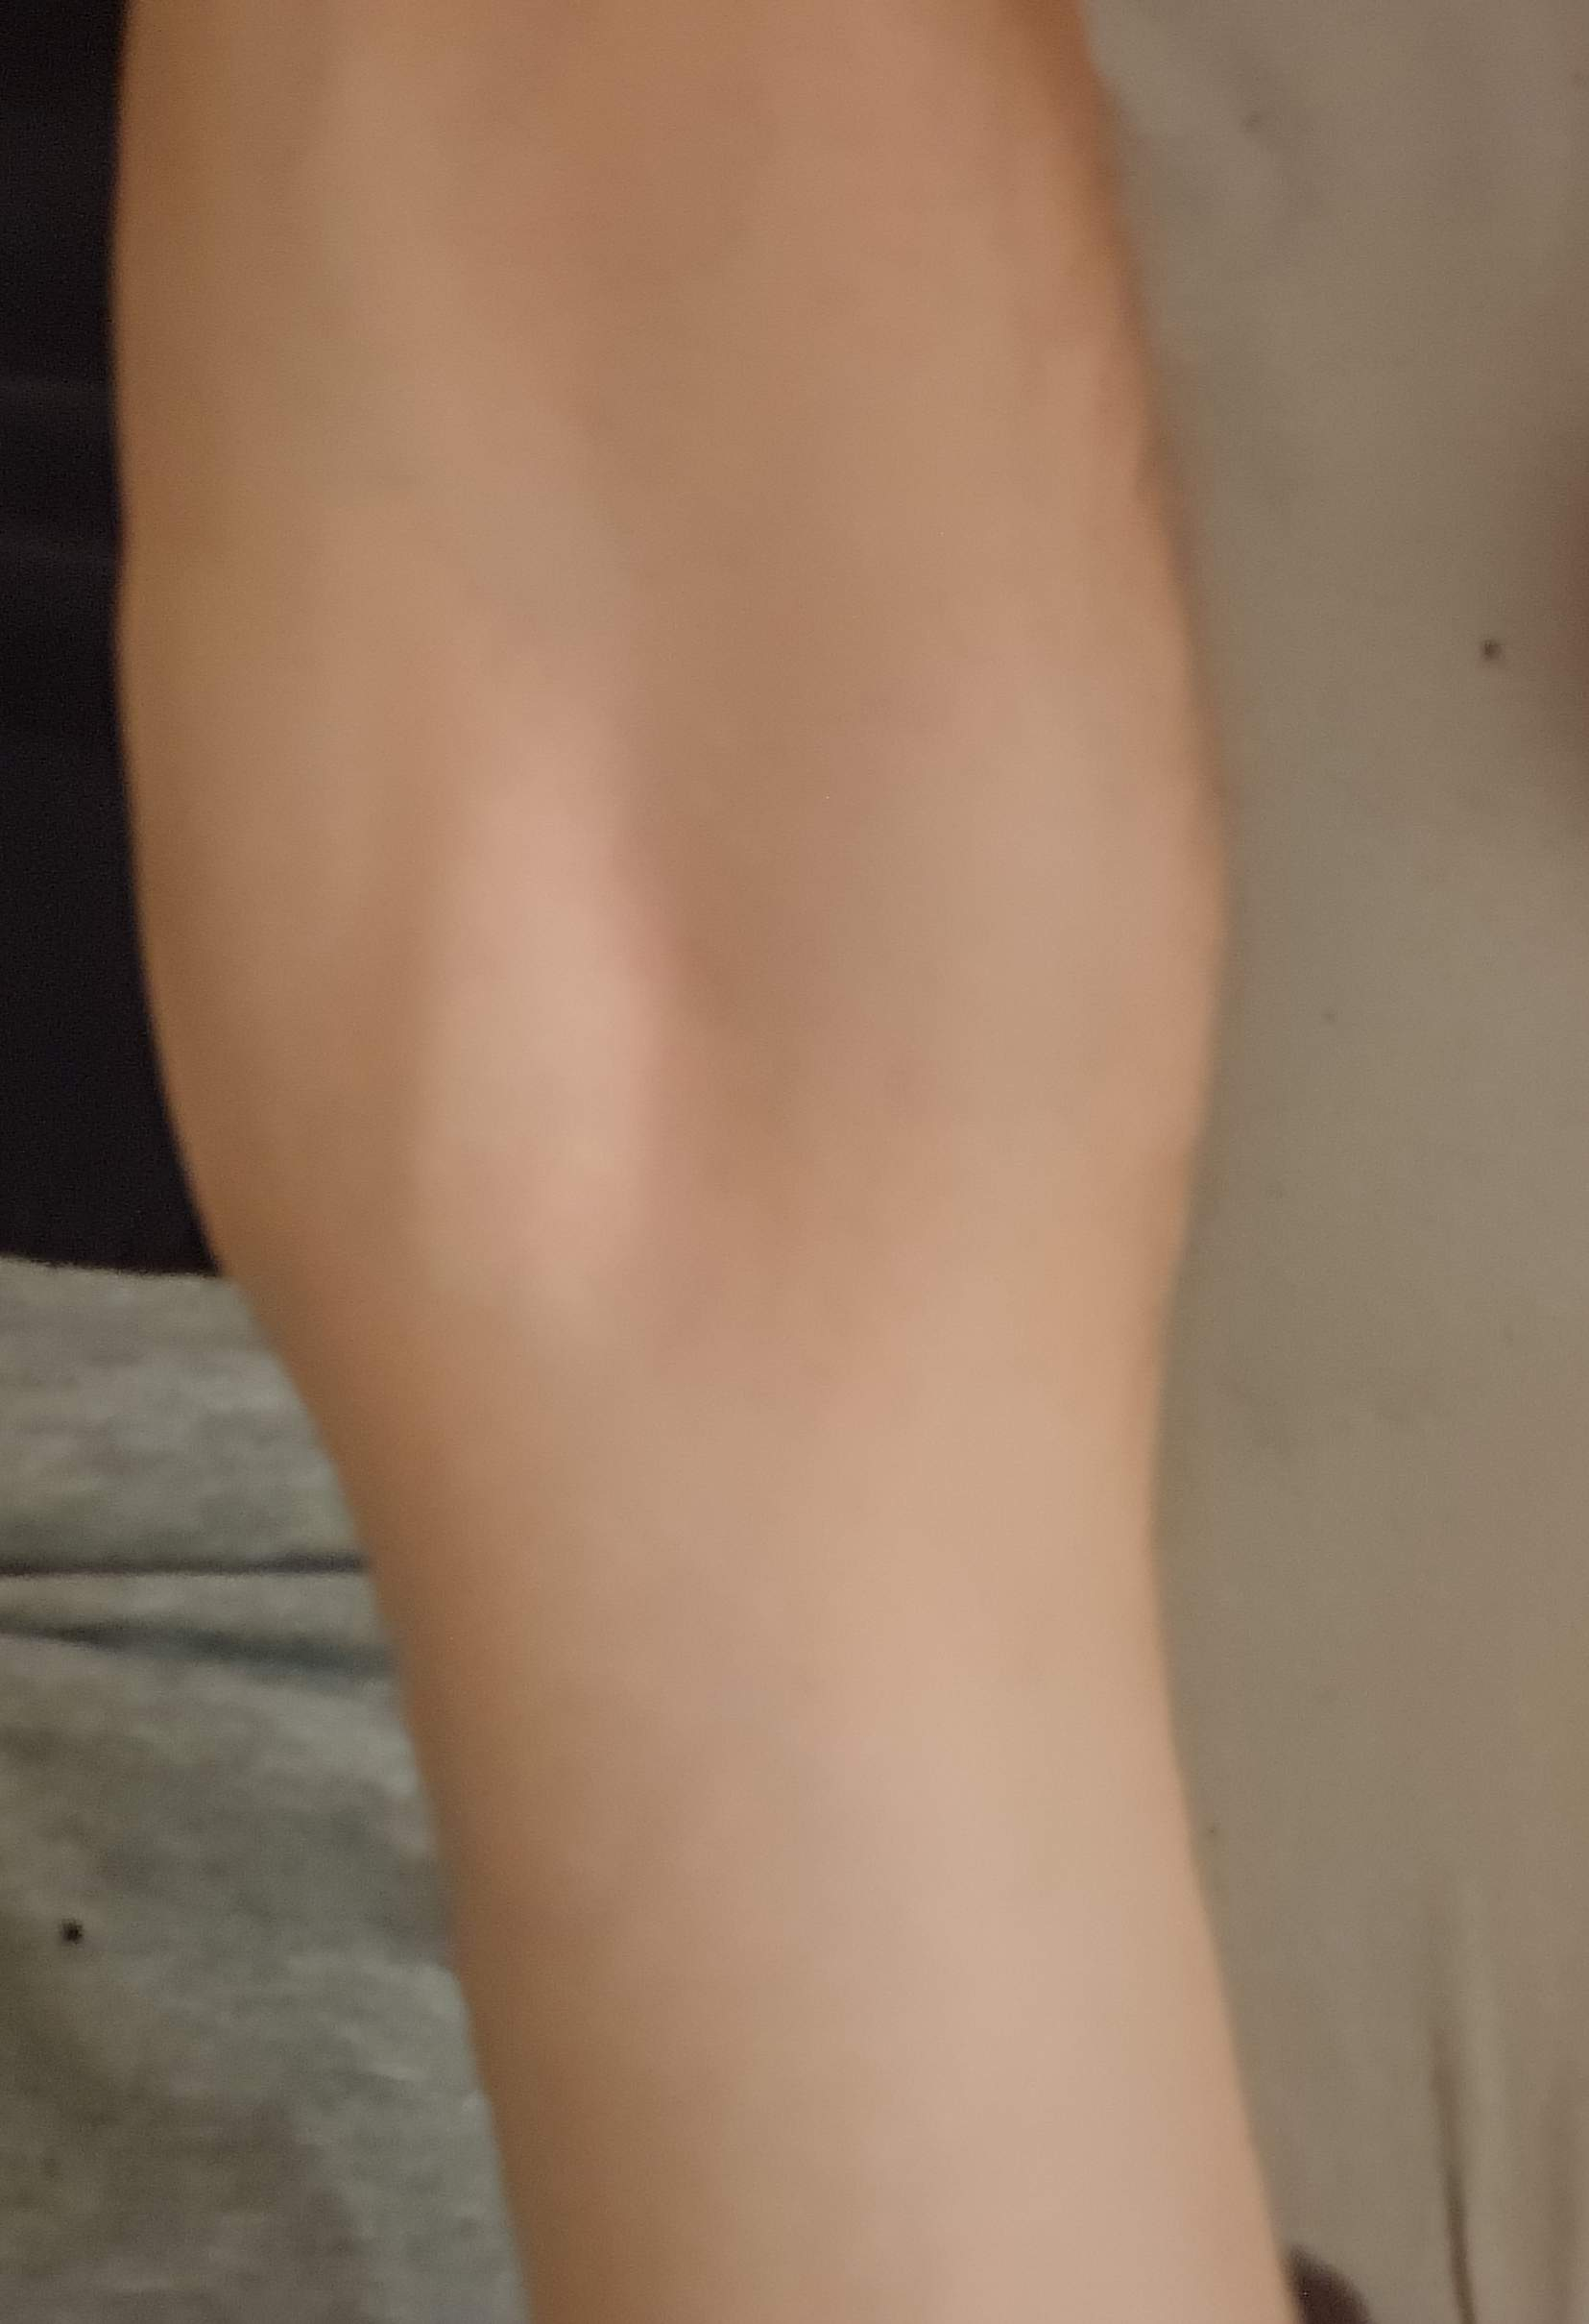 Oberarm muskel am knubbel Muskelfaserriss des